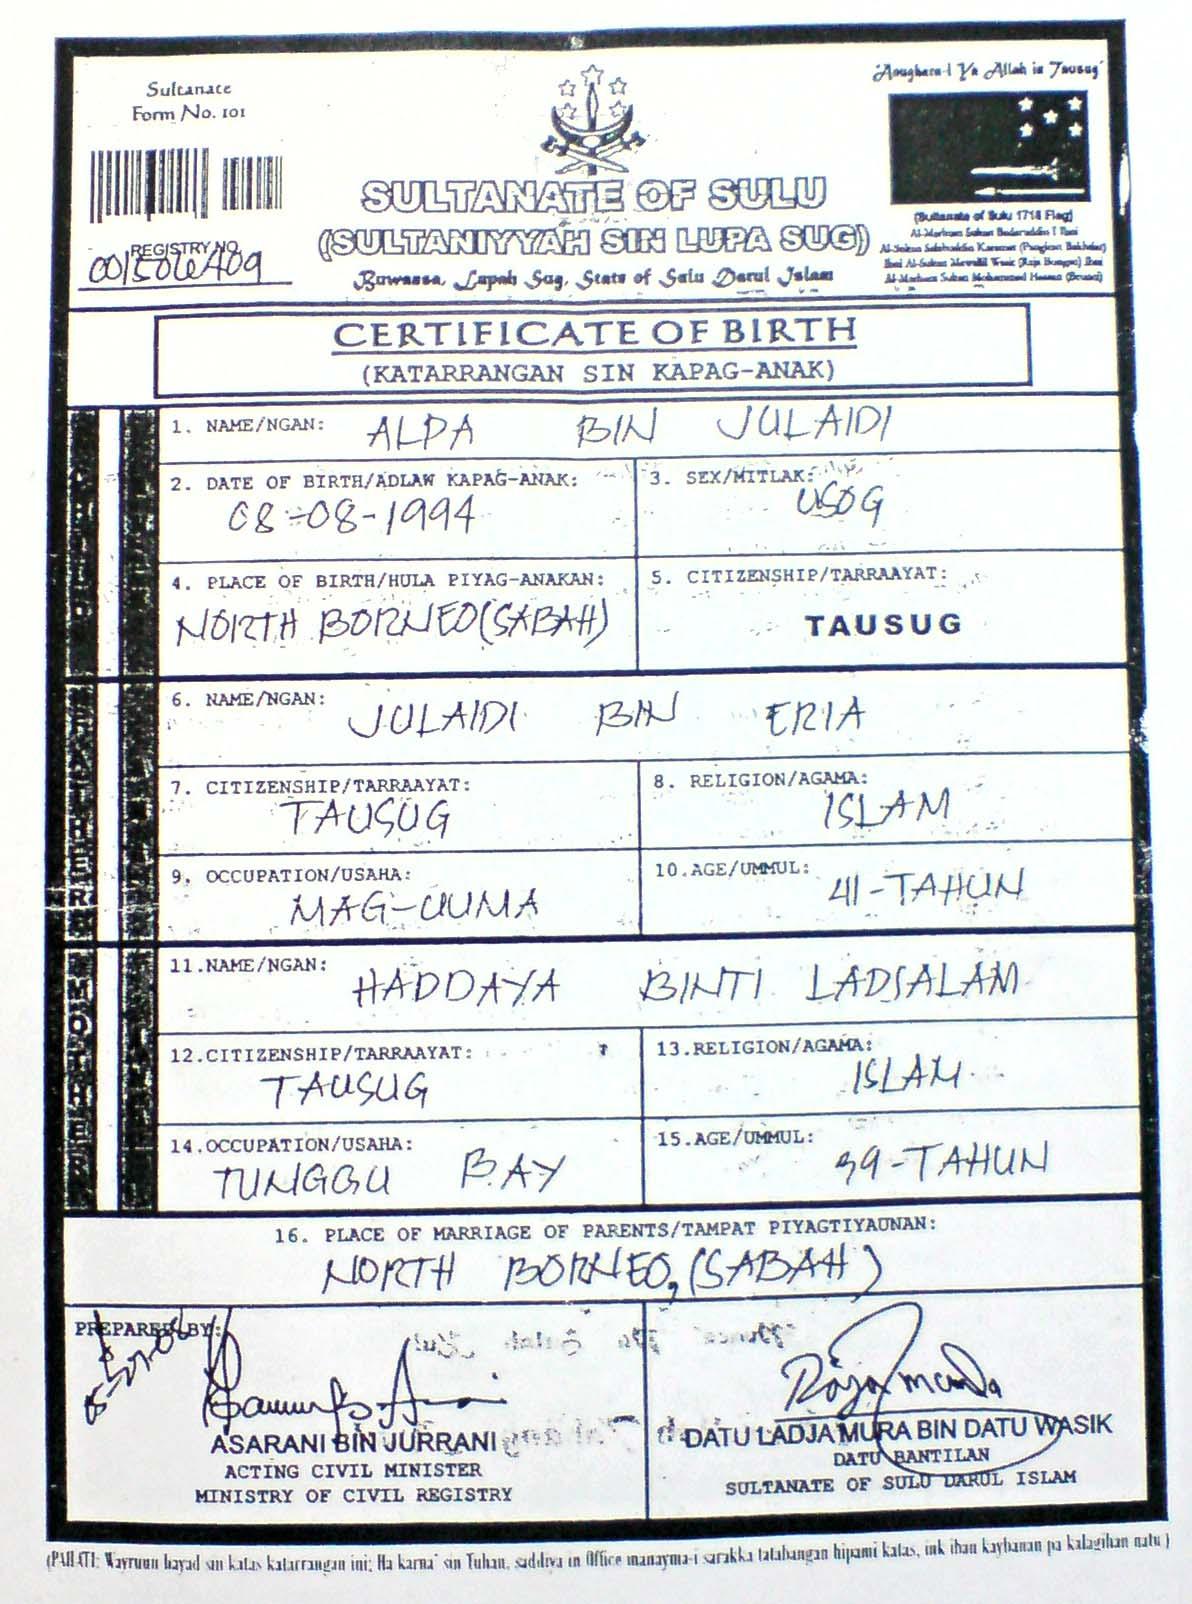 Sultanate of sulu north borneosabah issuing birth certificates sultante sulu certificate of birth aiddatafo Gallery